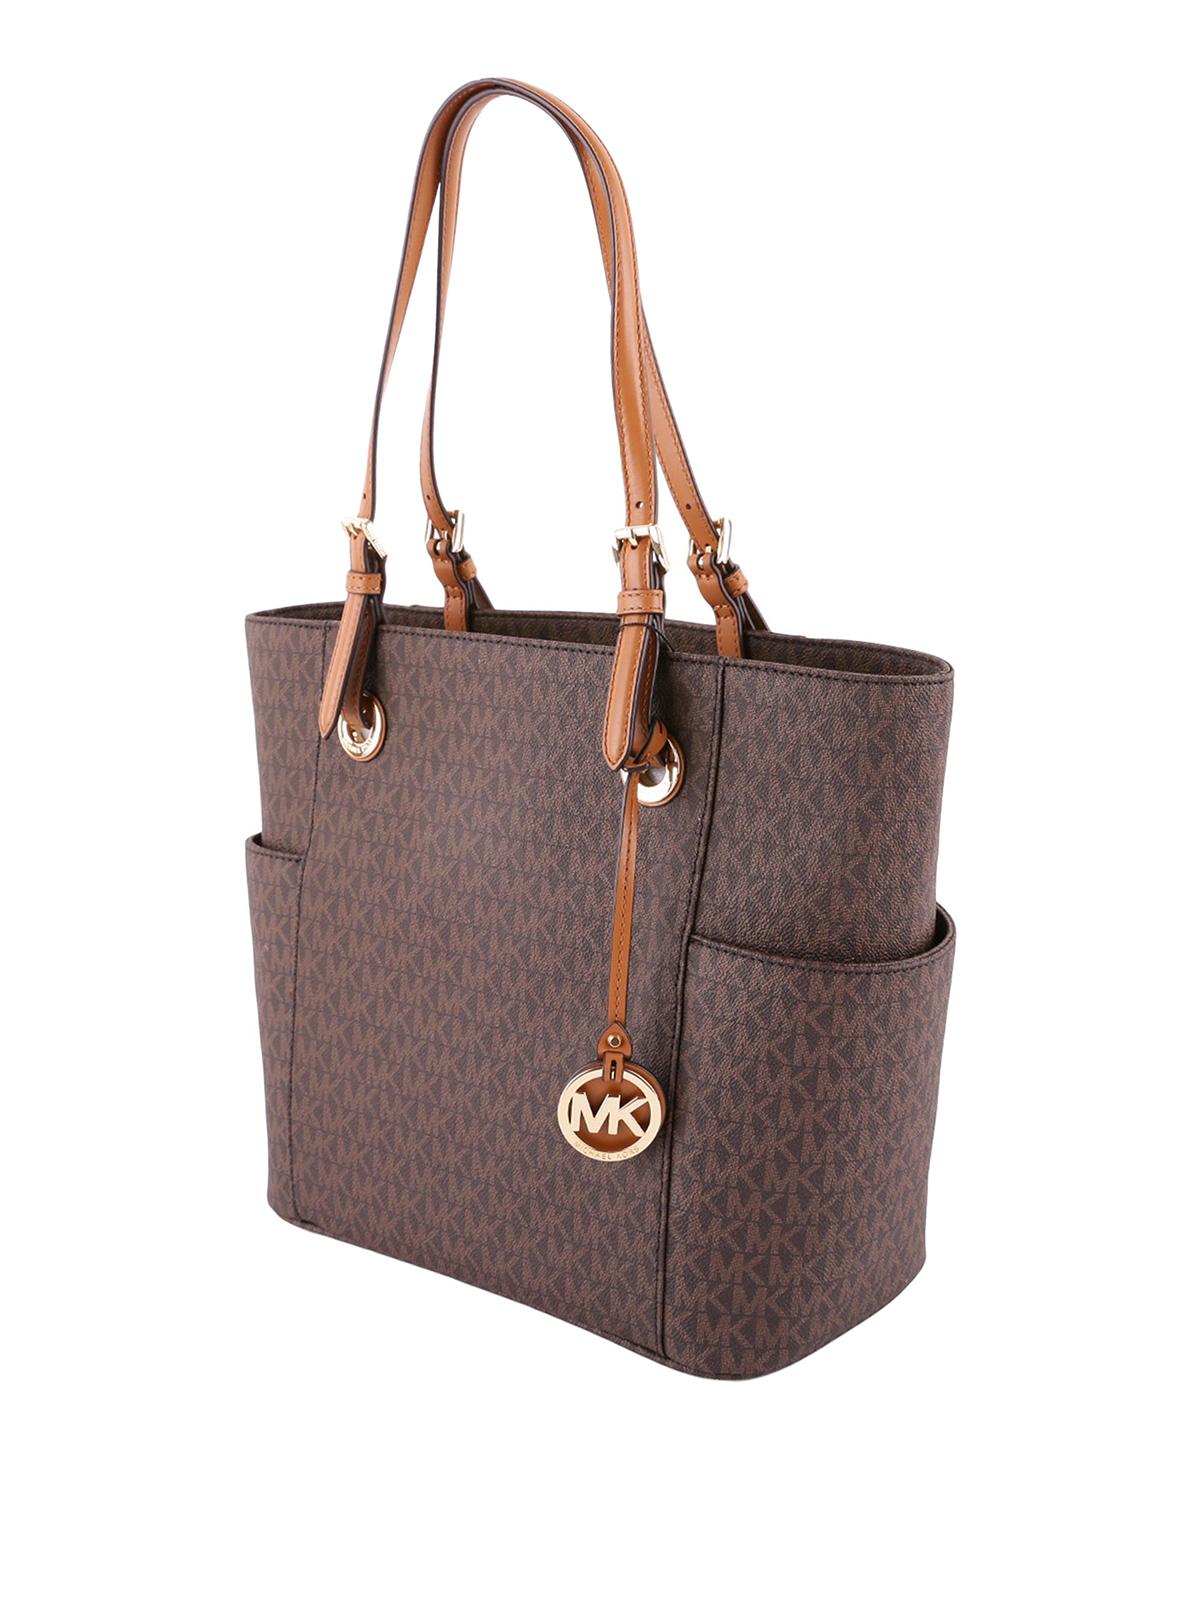 michael kors shopper braun handtaschen 30h6gttt3v. Black Bedroom Furniture Sets. Home Design Ideas